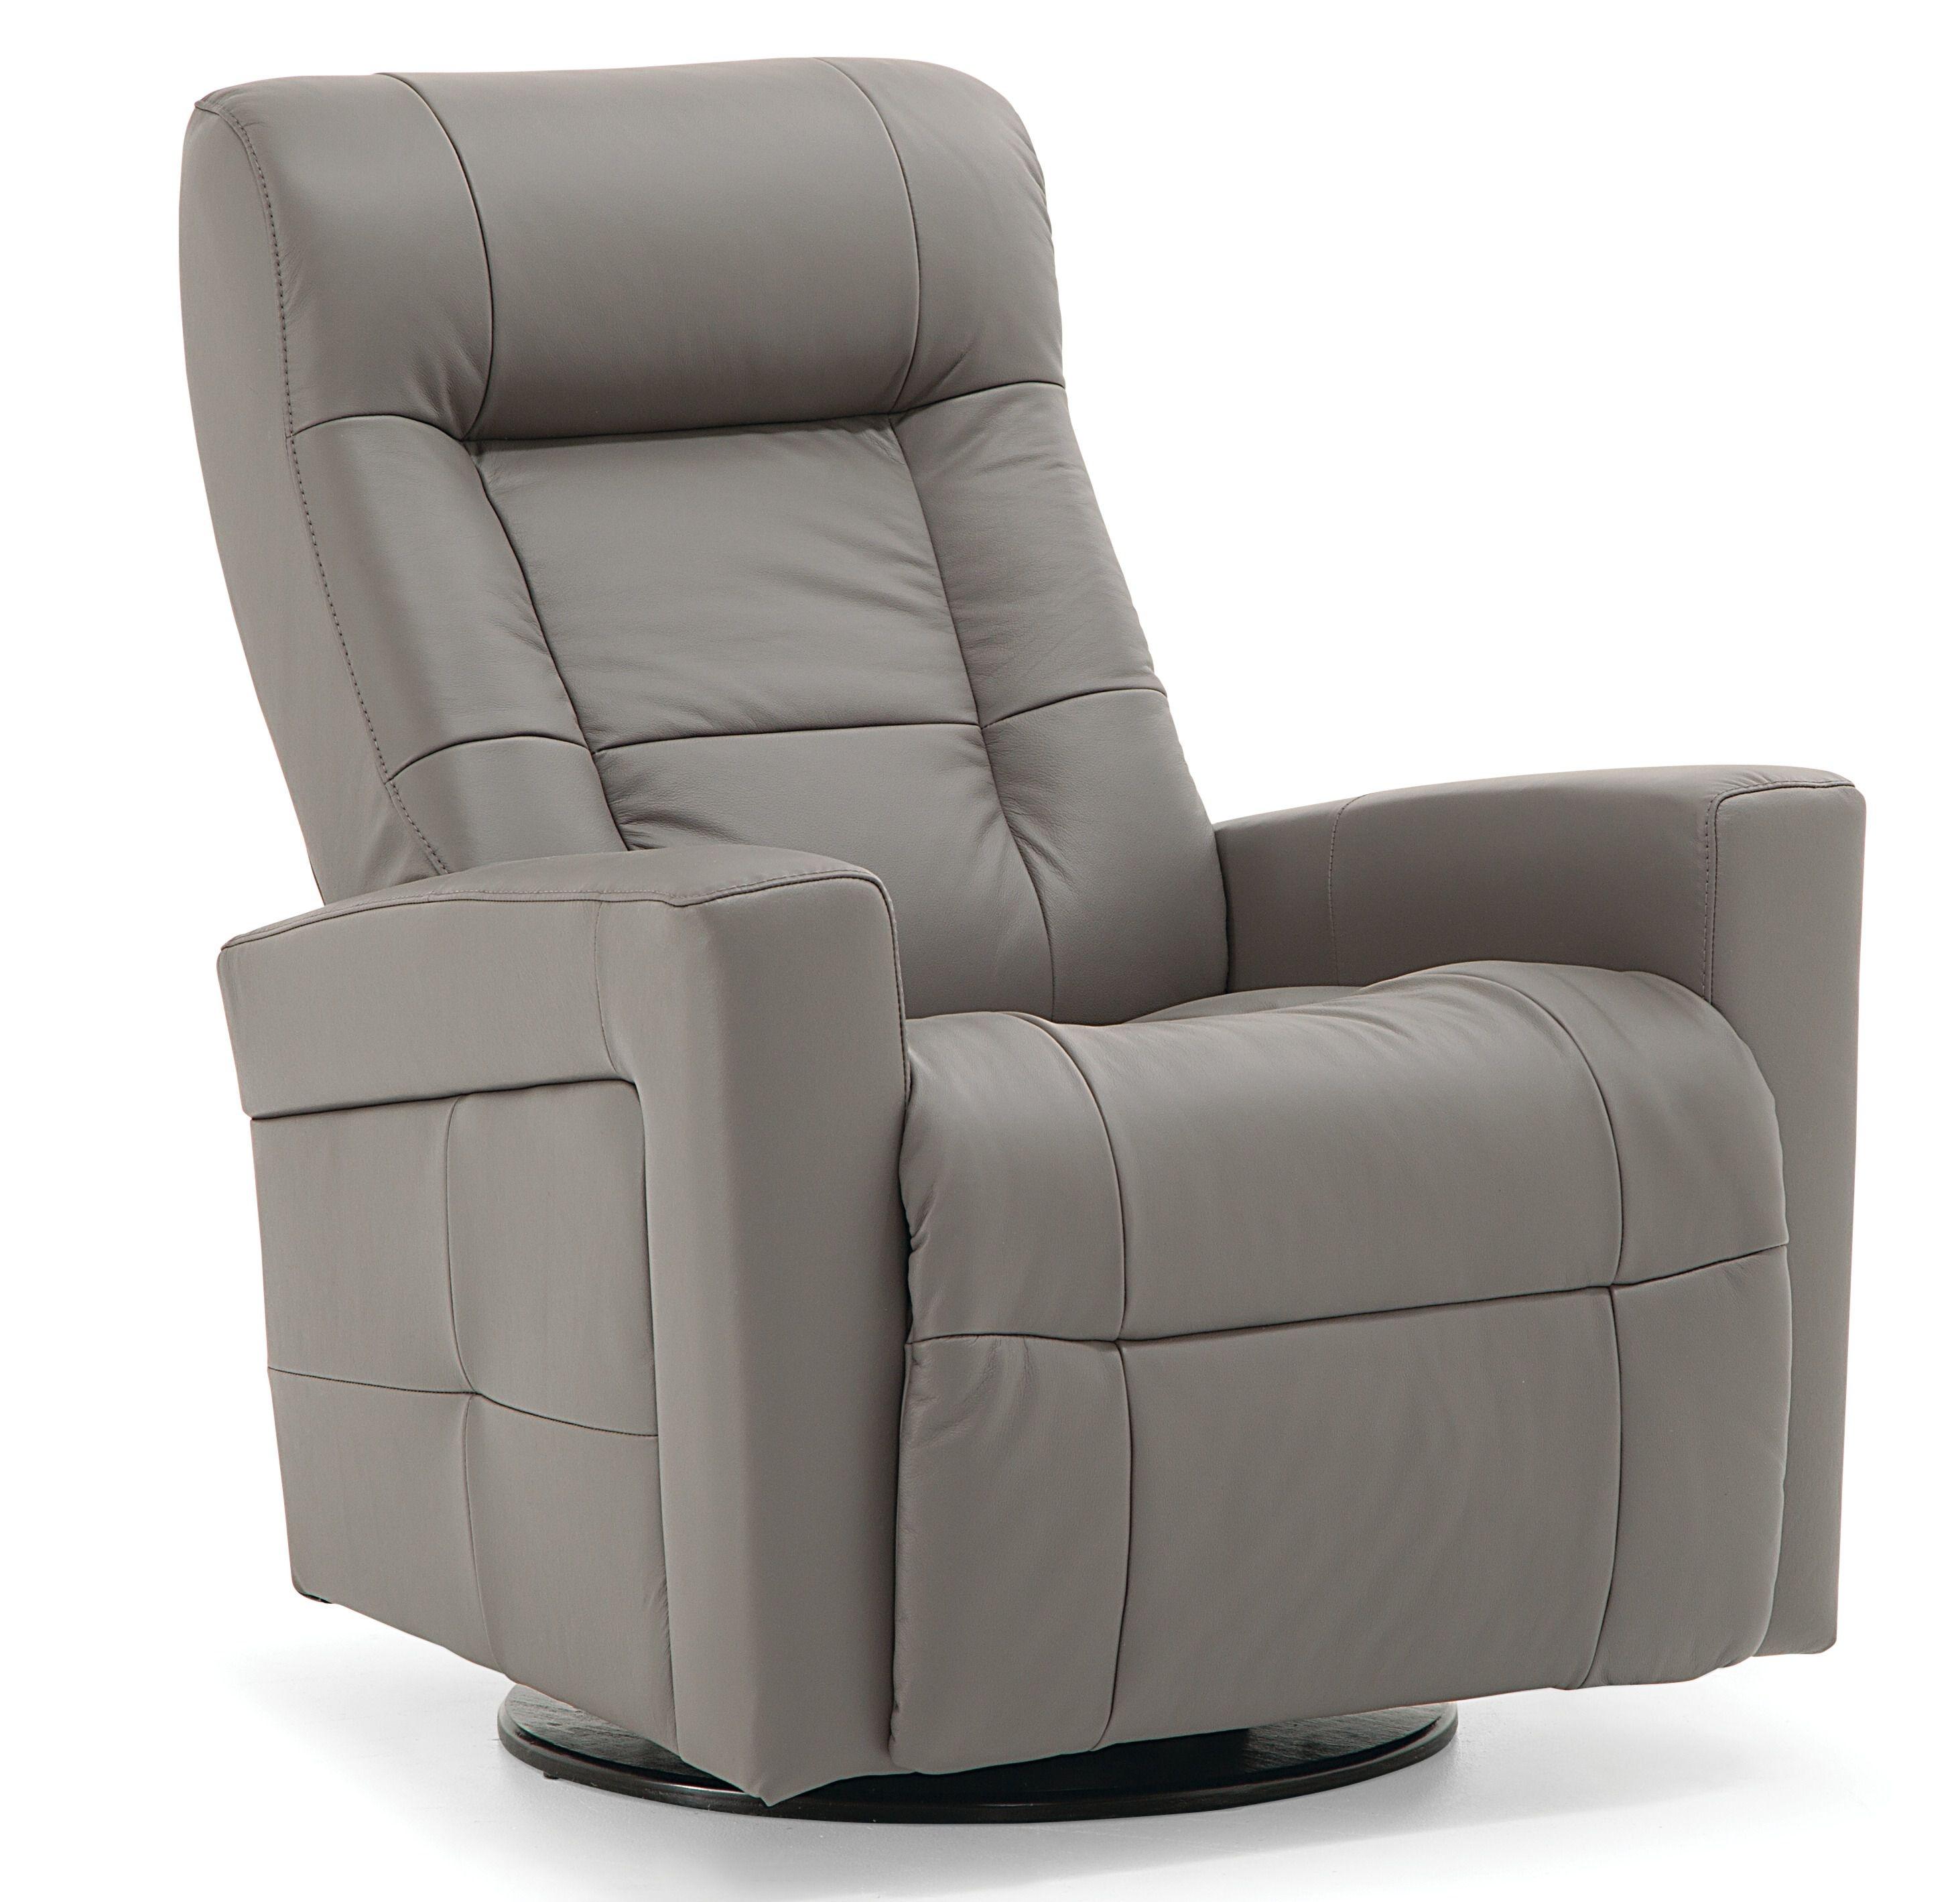 Palliser Furniture Swivel Glider Recliner Power 43212 38